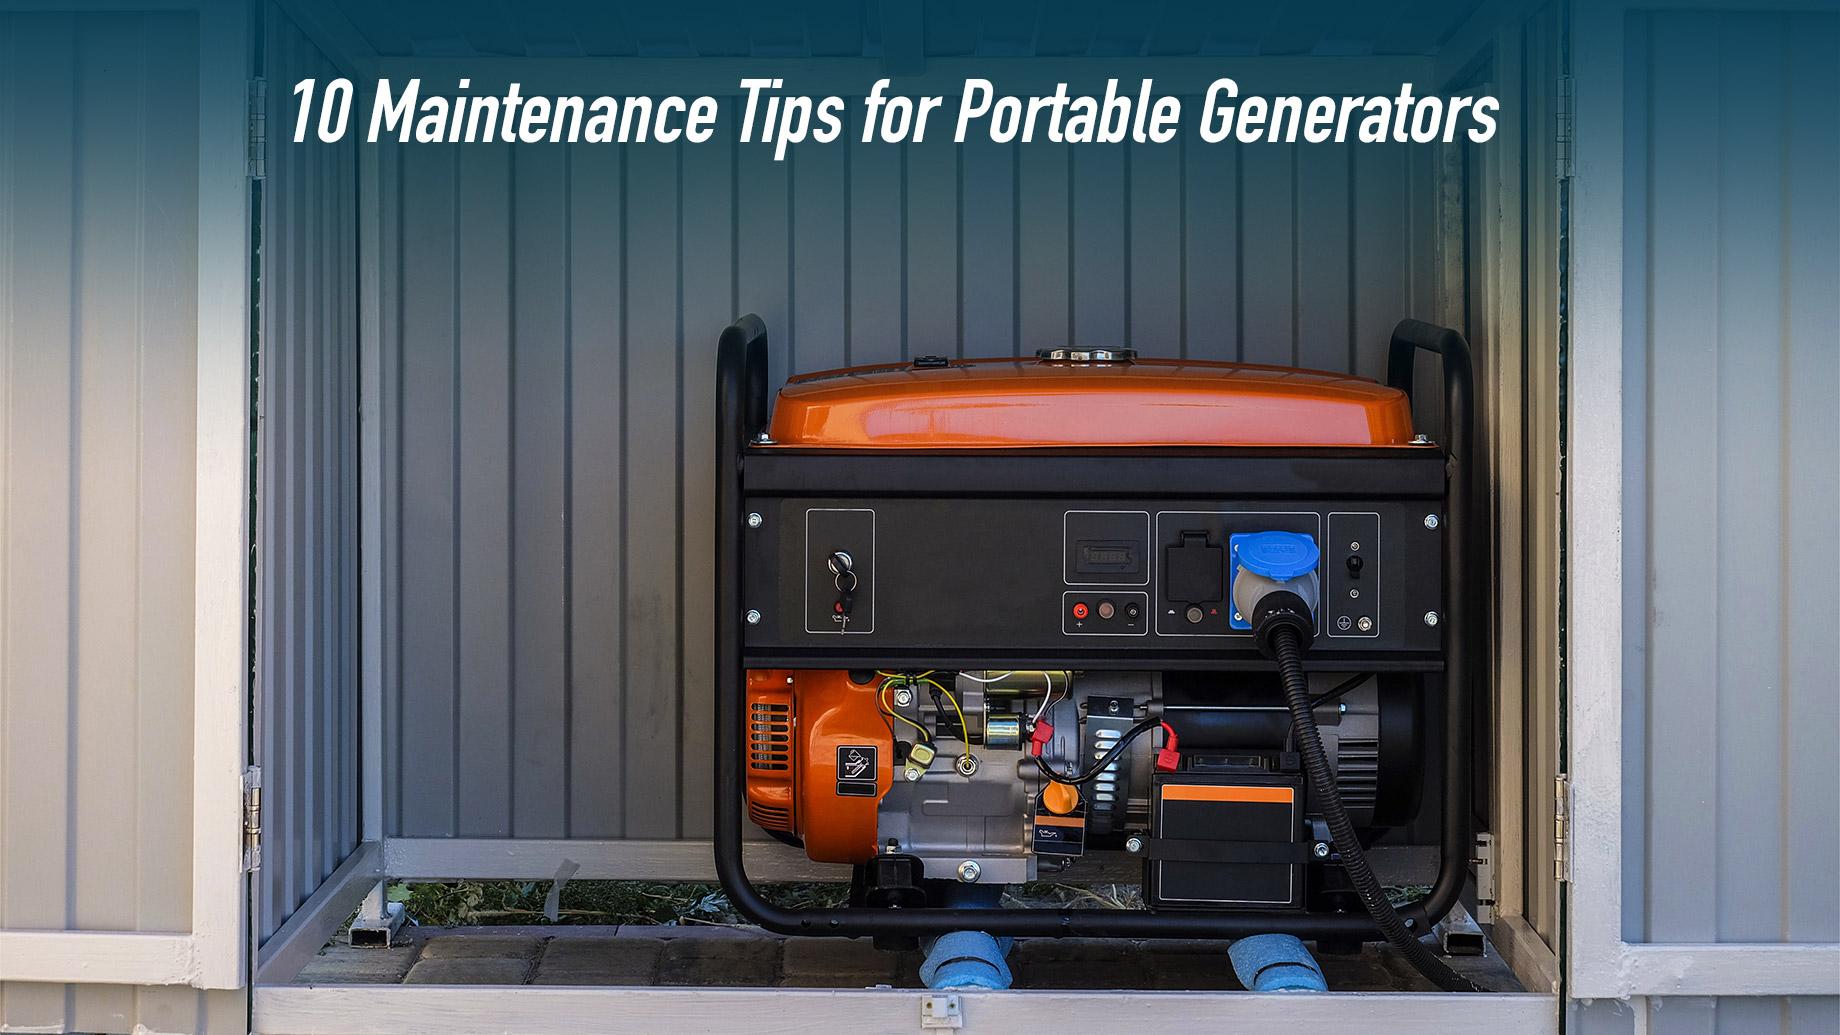 10 Maintenance Tips for Portable Generators